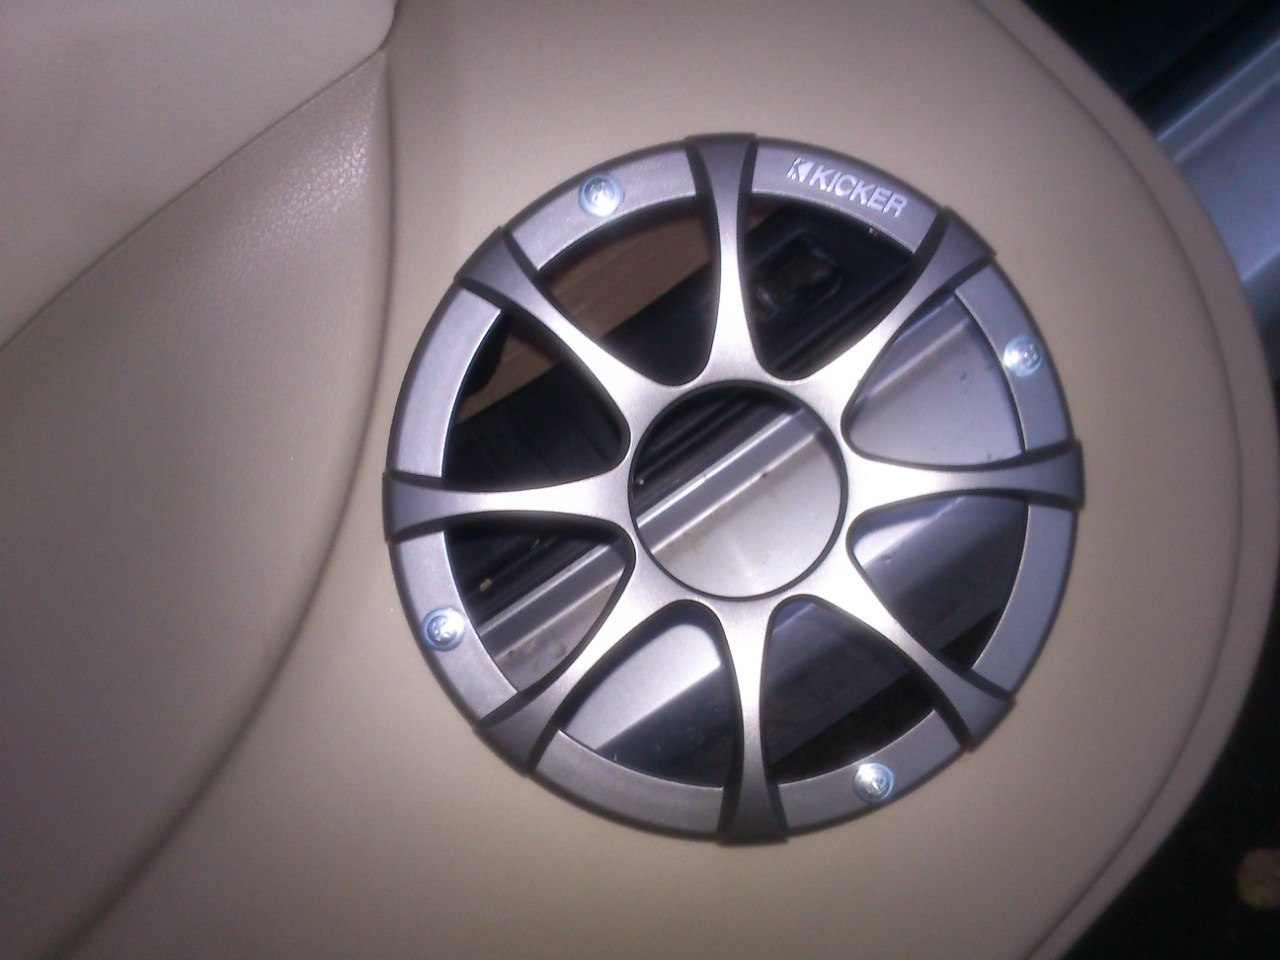 Защитная решетка колонки Kicker в Nissan Bluebird Axis (Infiniti G20)